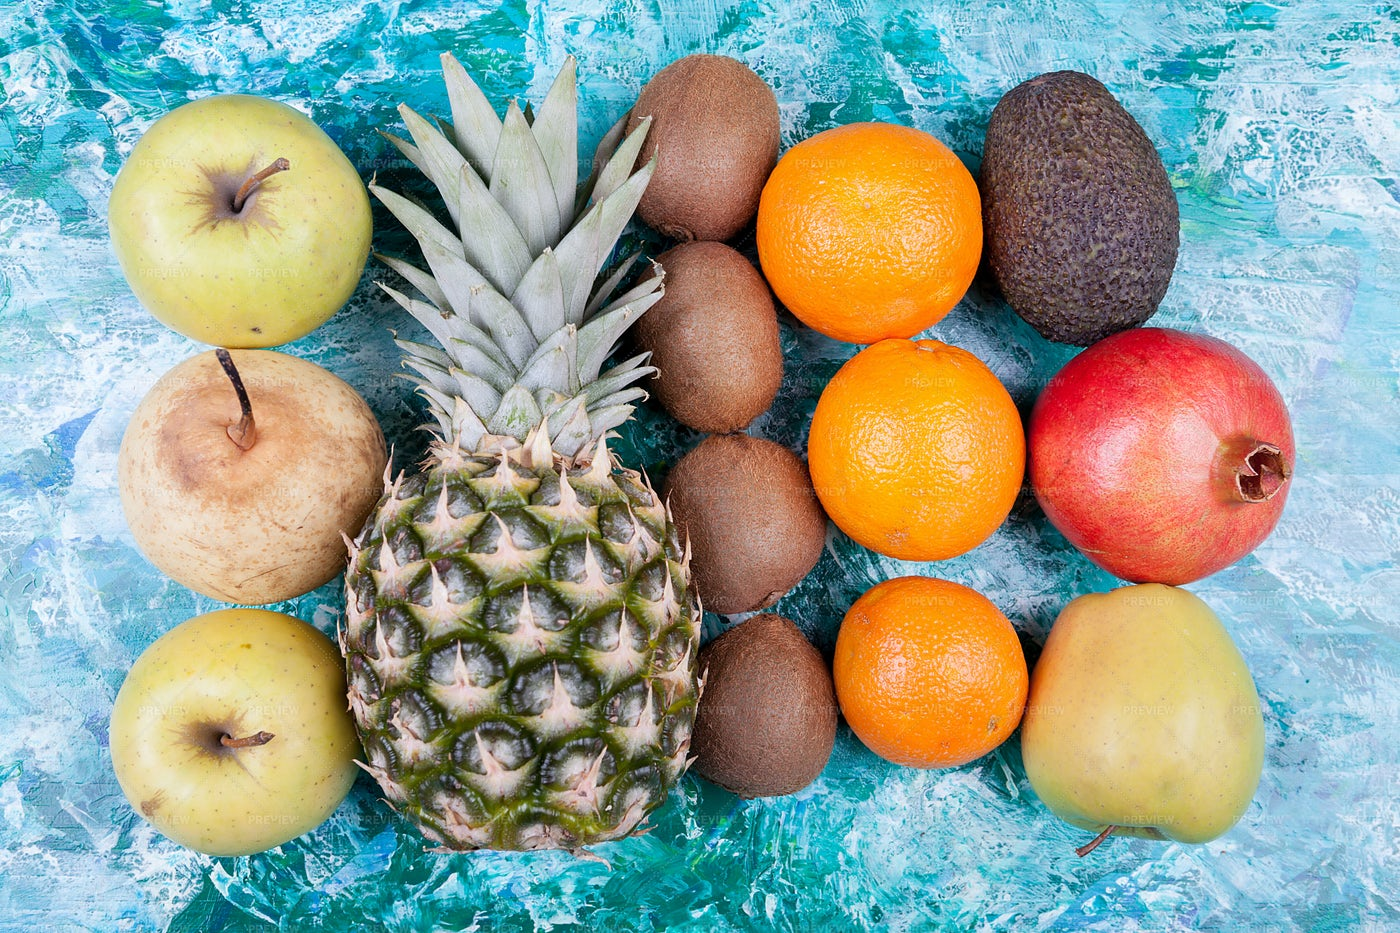 Fruits On Blue Background: Stock Photos